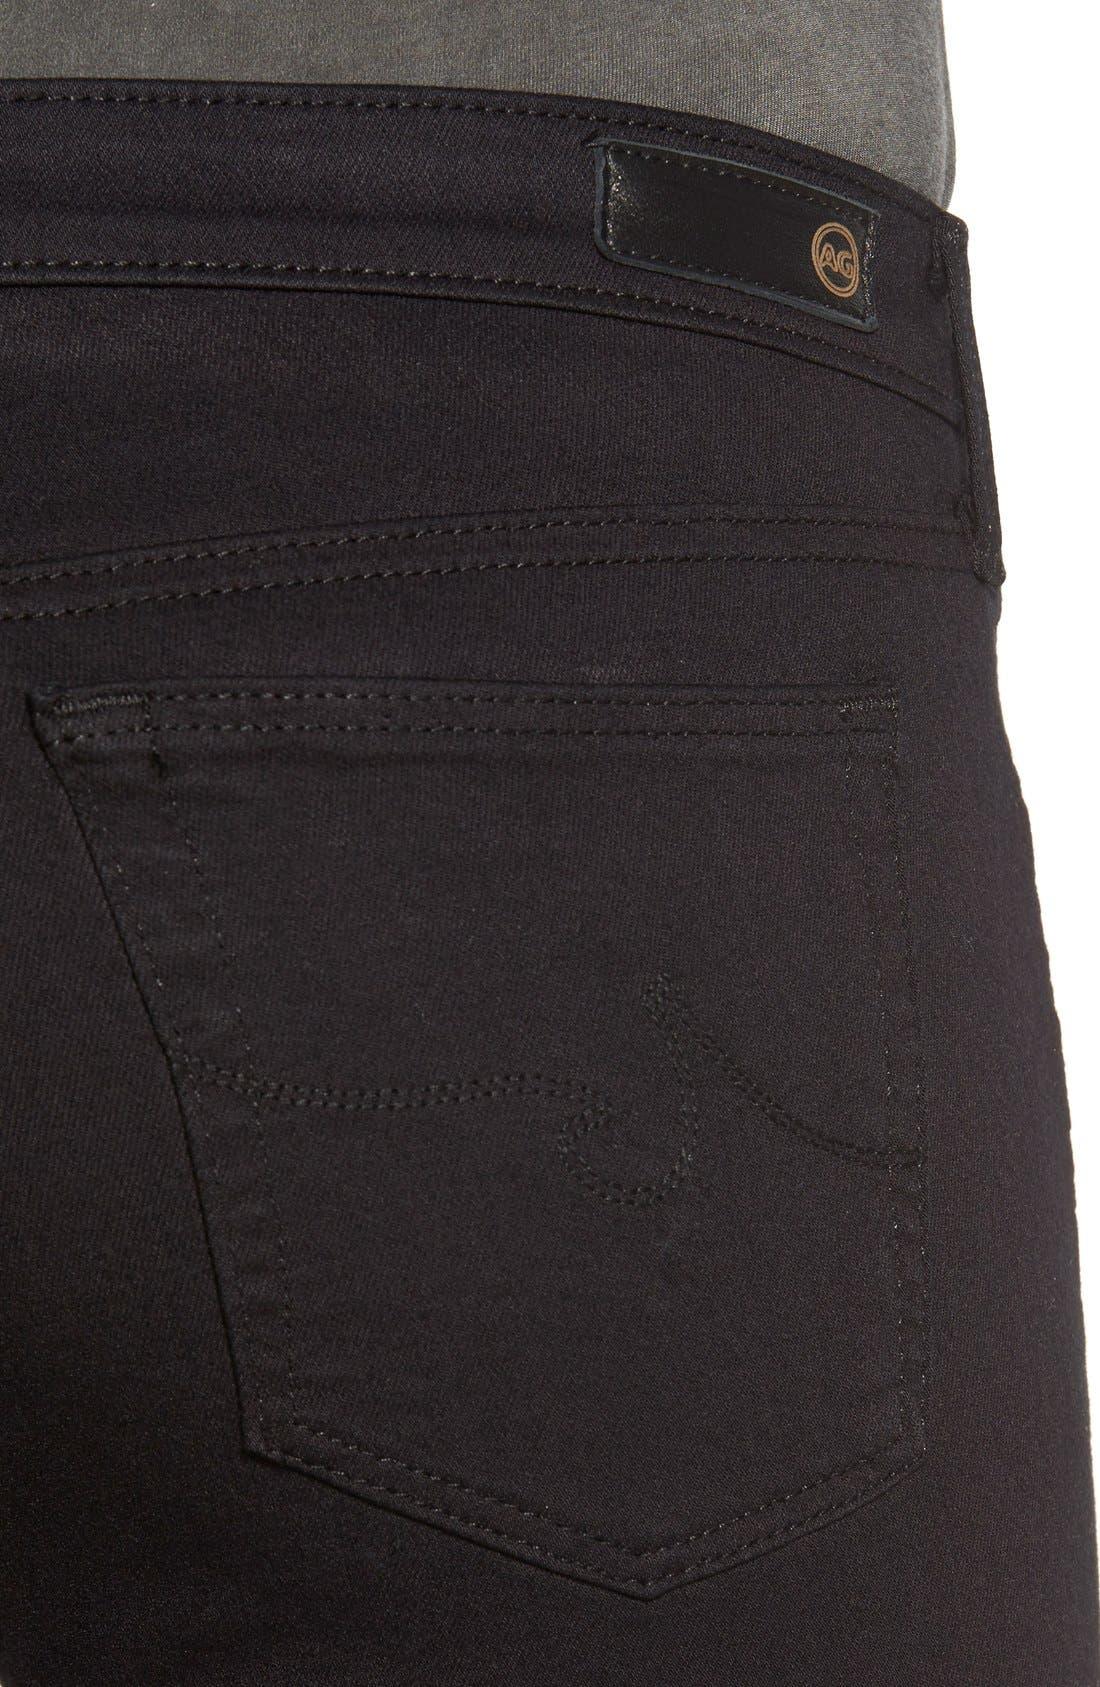 'The Legging' Ankle Super Skinny Jeans,                             Alternate thumbnail 4, color,                             SUPER BLACK